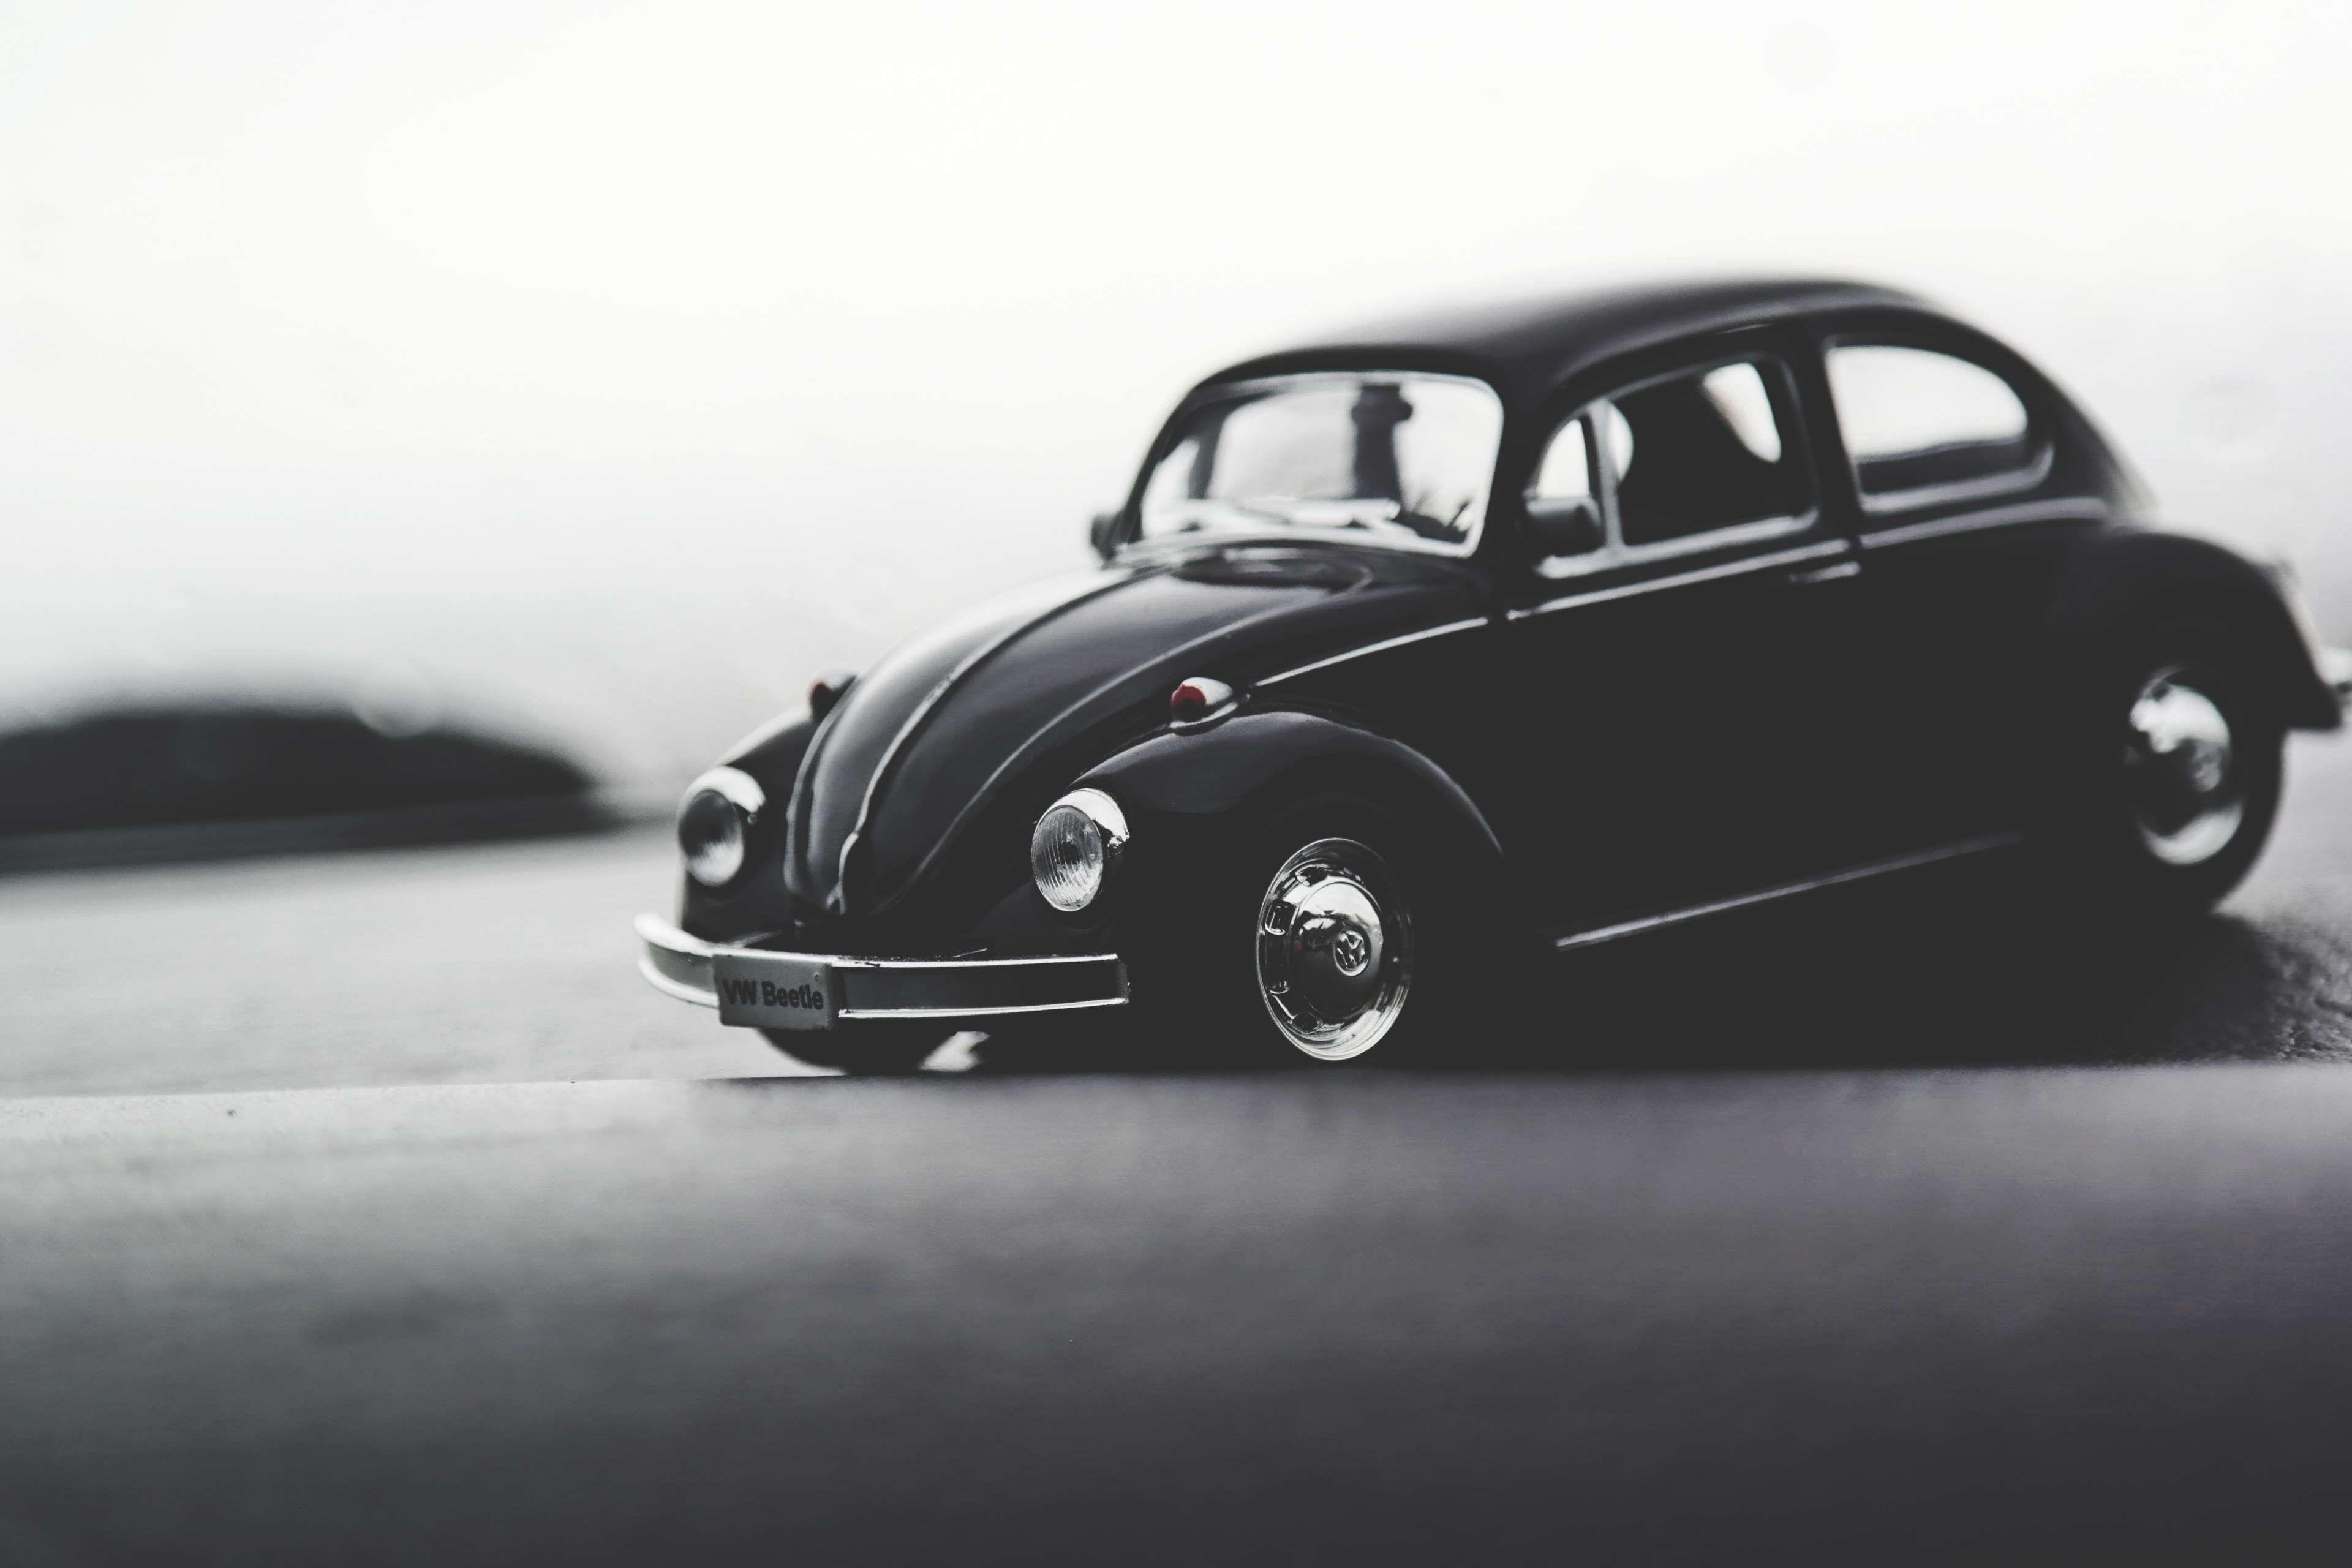 #automobile #car #classic car #toy car #volkswagen #volkswagen beetle